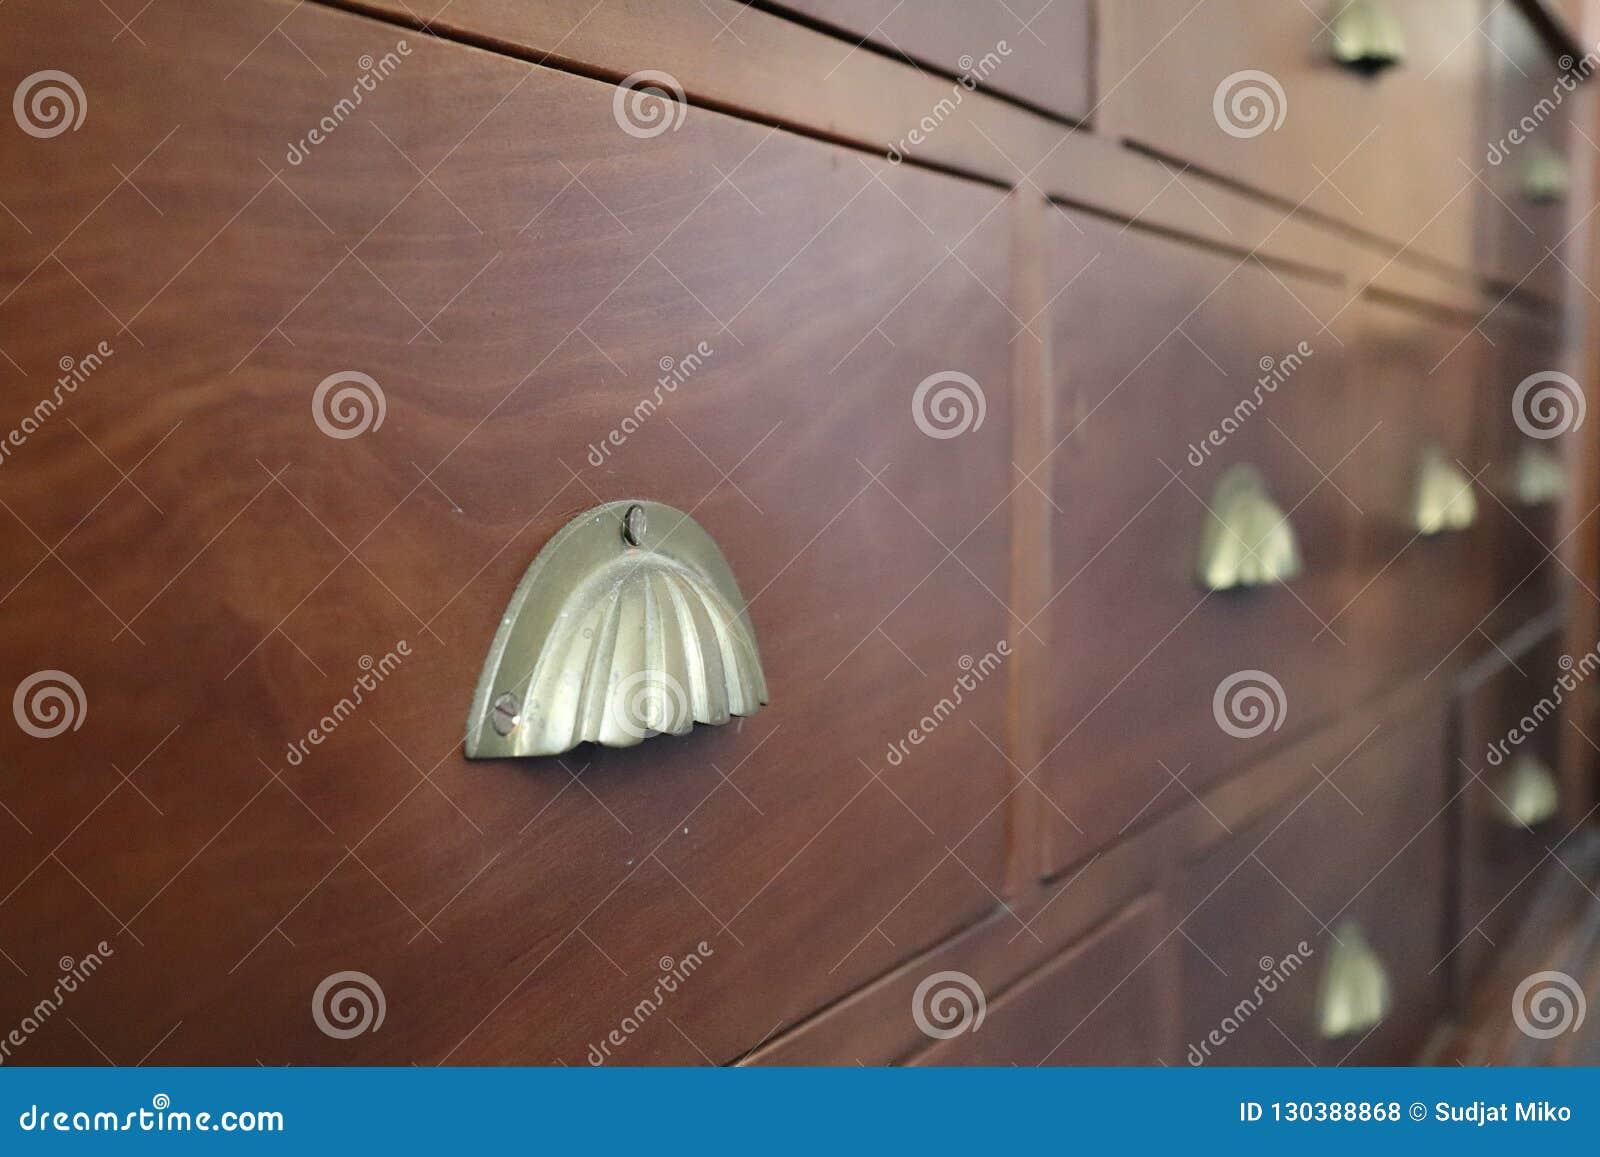 Antique clothes drawer, unique drawer handles, wood furniture.